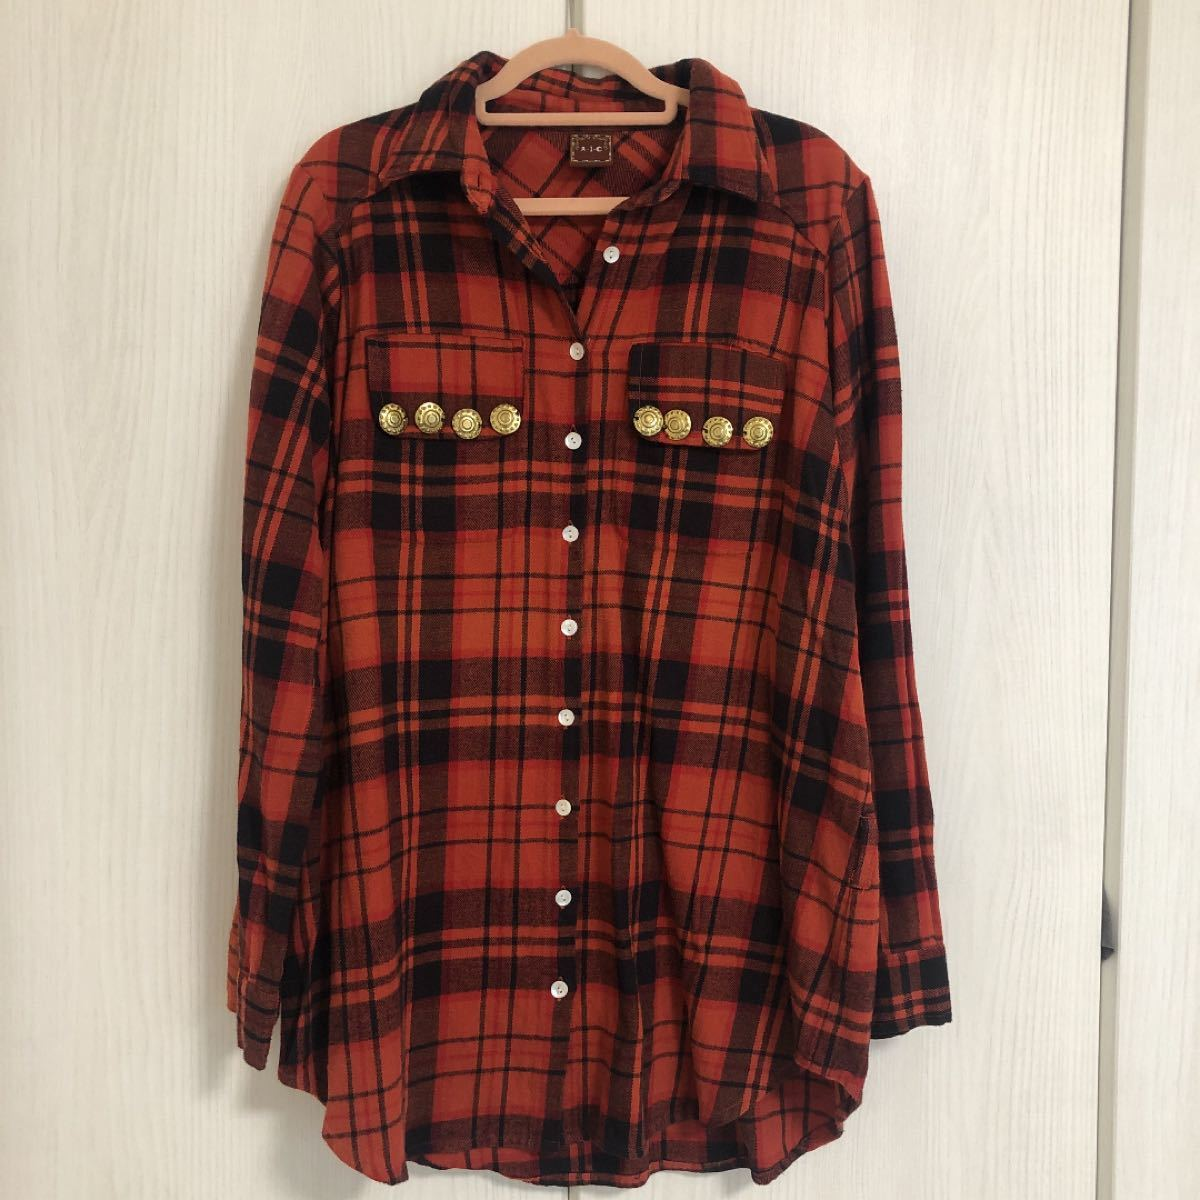 AIC  チェックシャツ 長袖シャツ チェック柄 チェックネルシャツ 赤